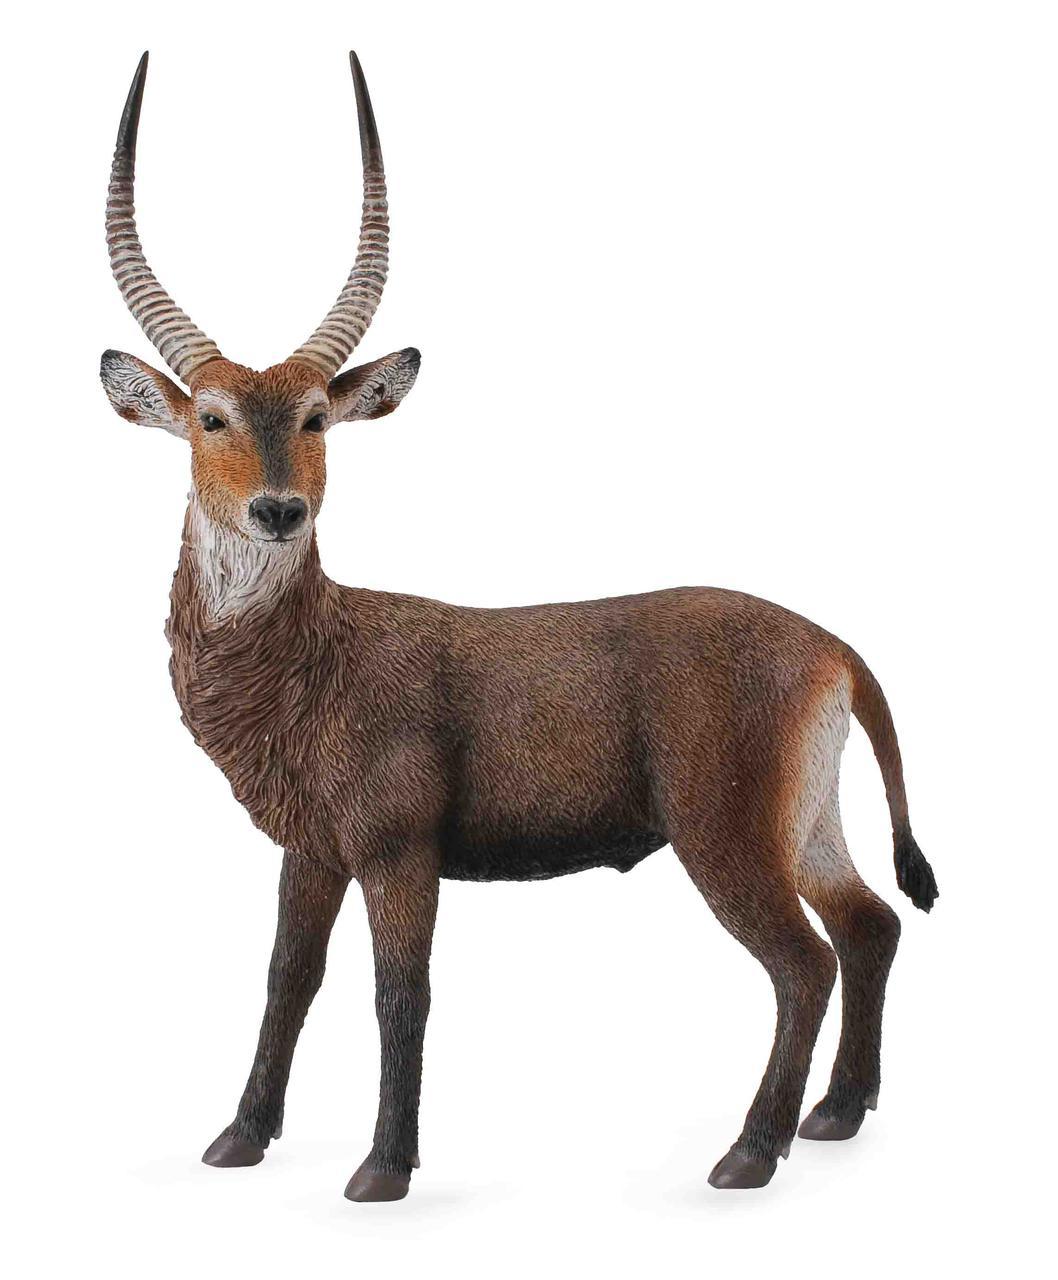 CollectA Фигурка Водяной козел, длина 13.5 см